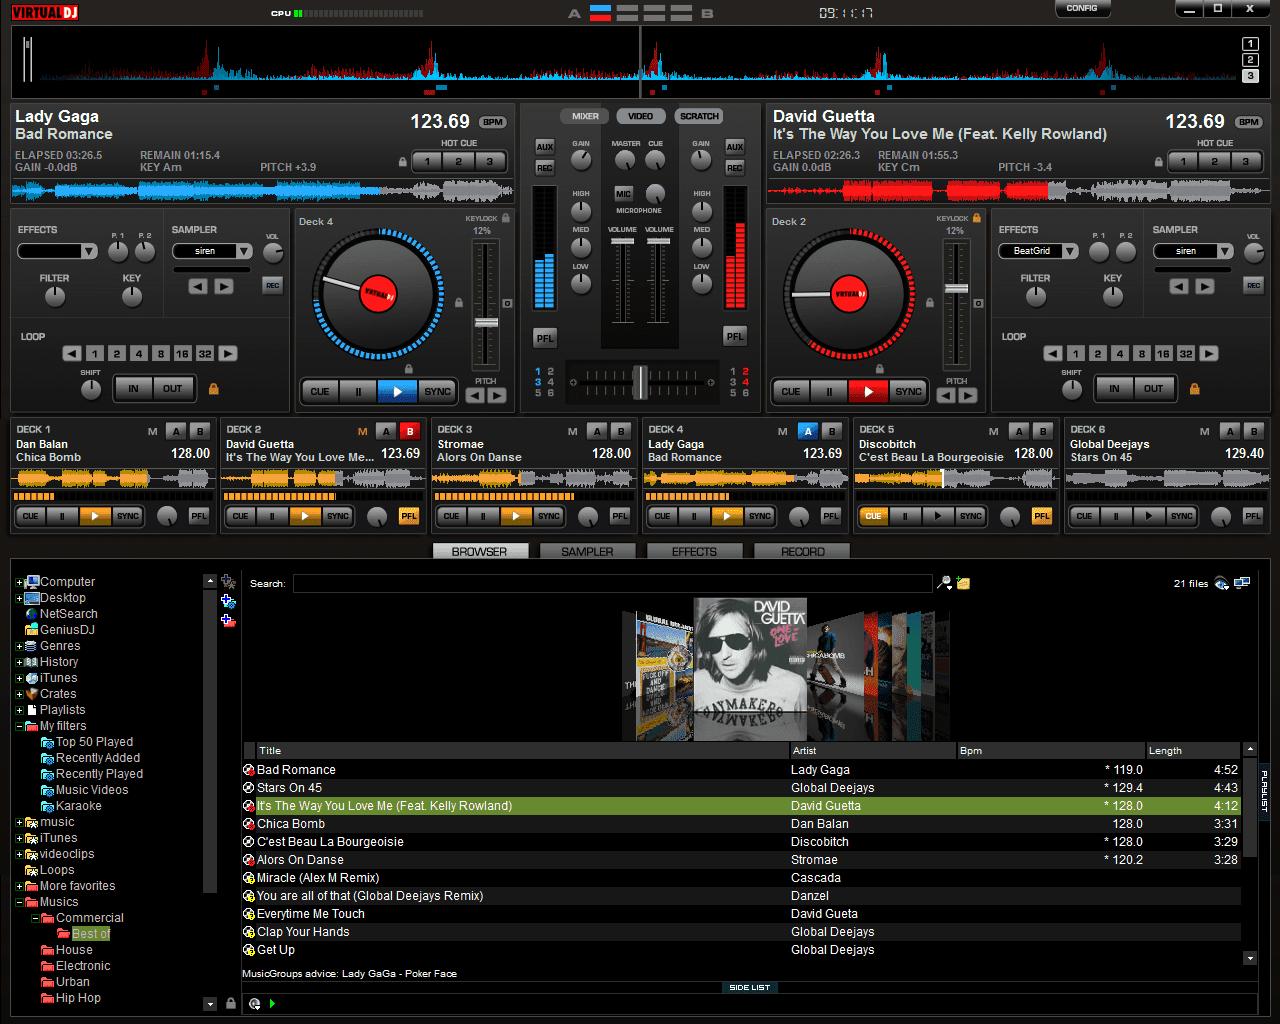 Virtual Dj 6 Pro Download For Pc